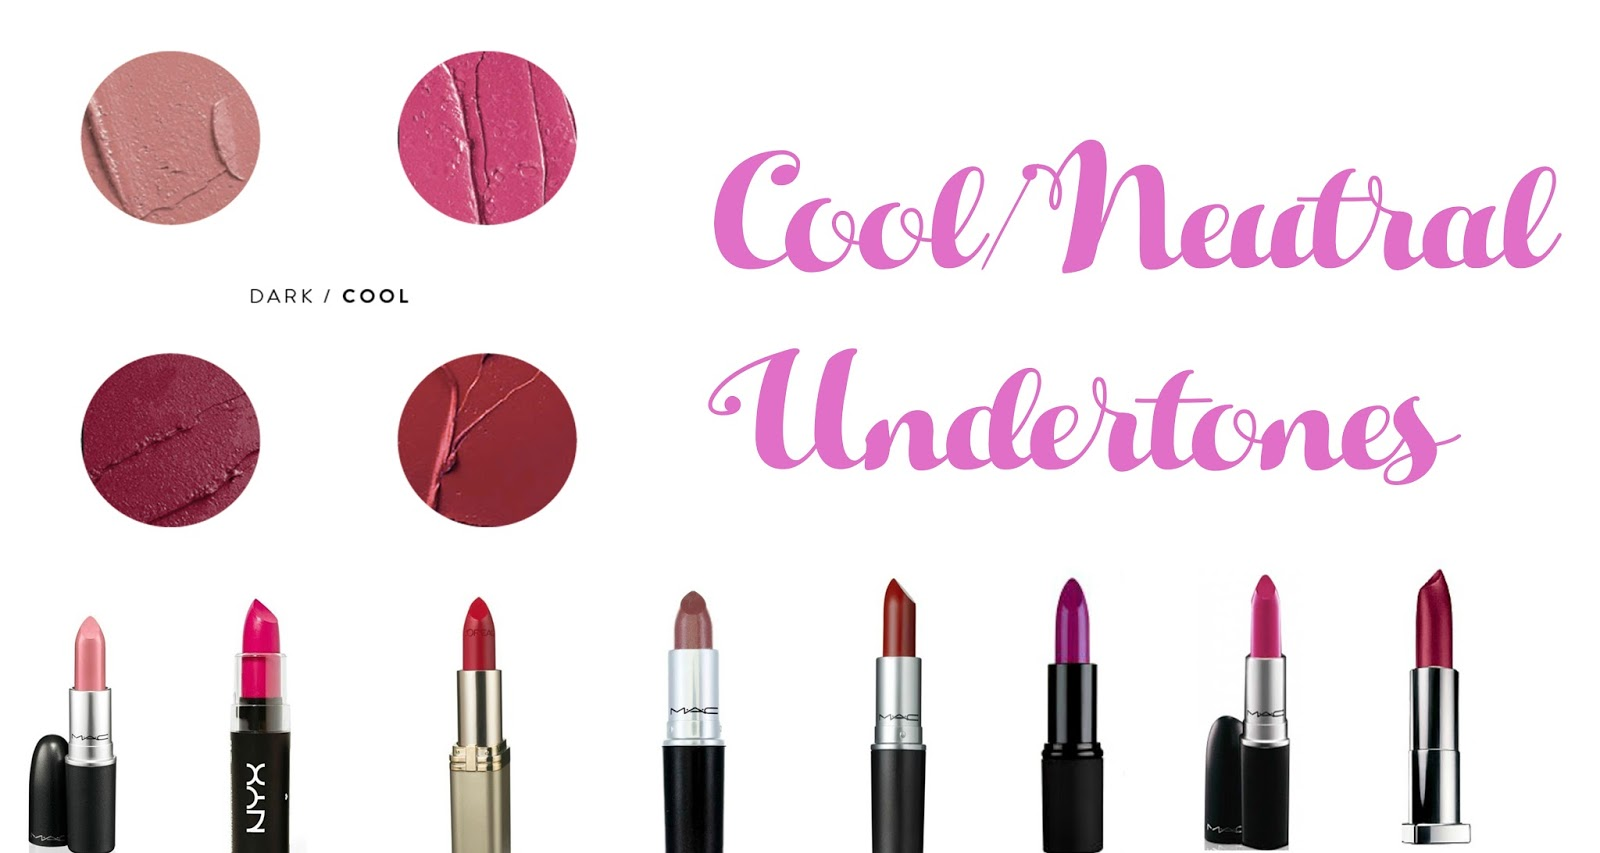 Lip colors for cool undertones